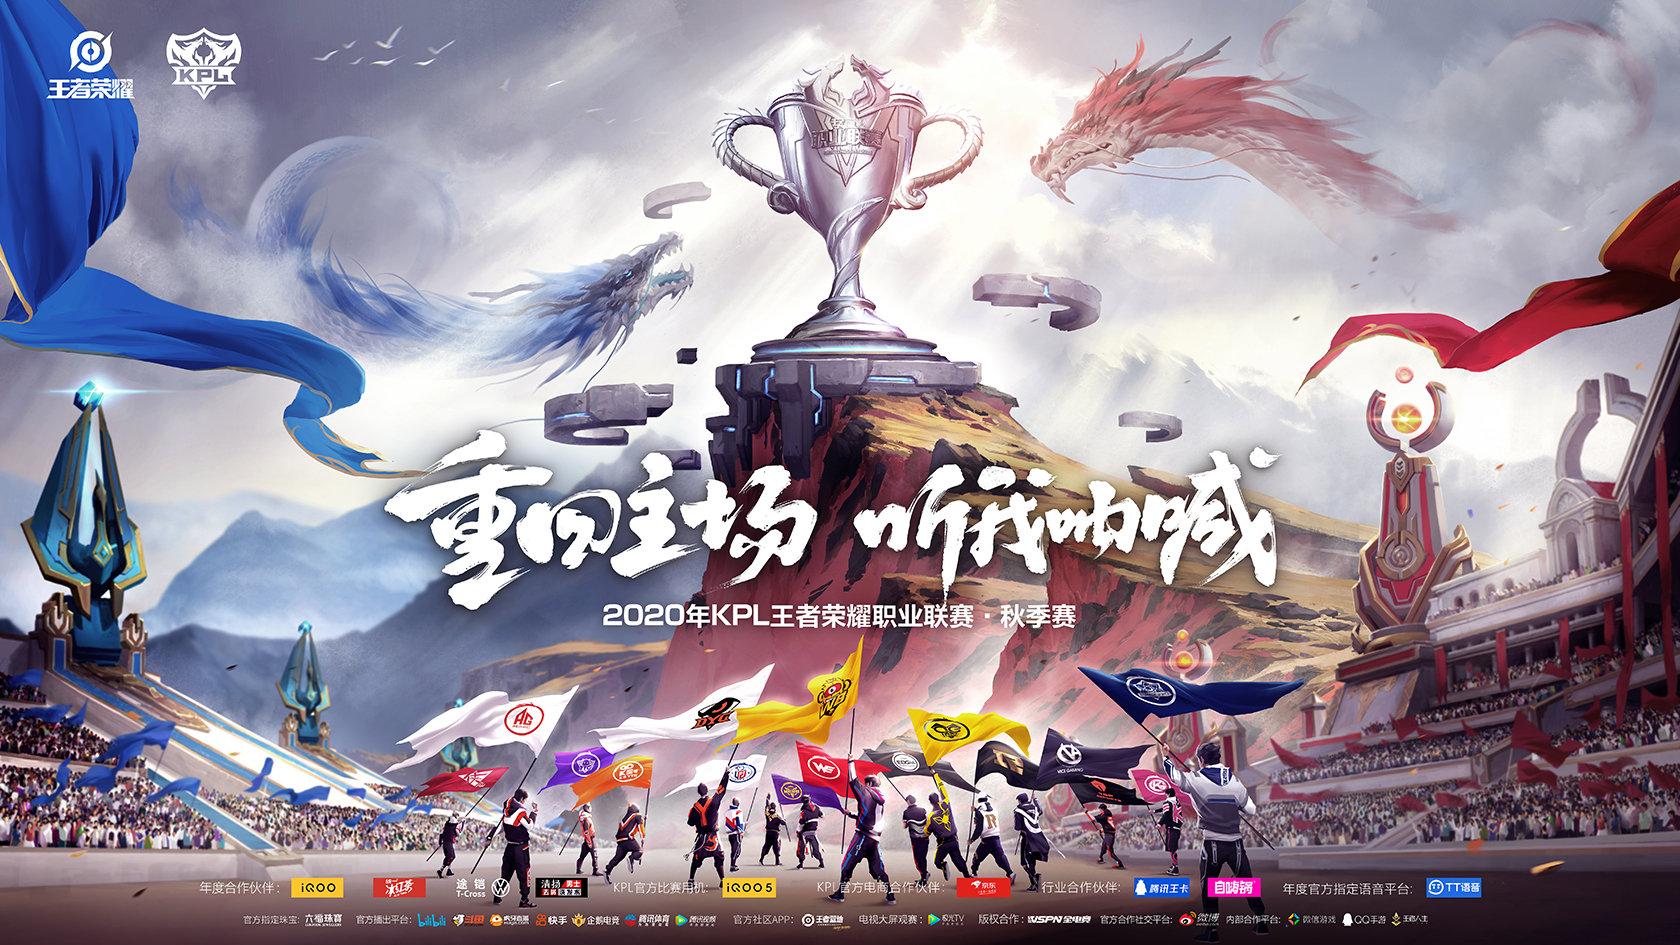 2020kpl秋季赛常规赛9月16日Hero久竞vsTTG第四场比赛视频回放